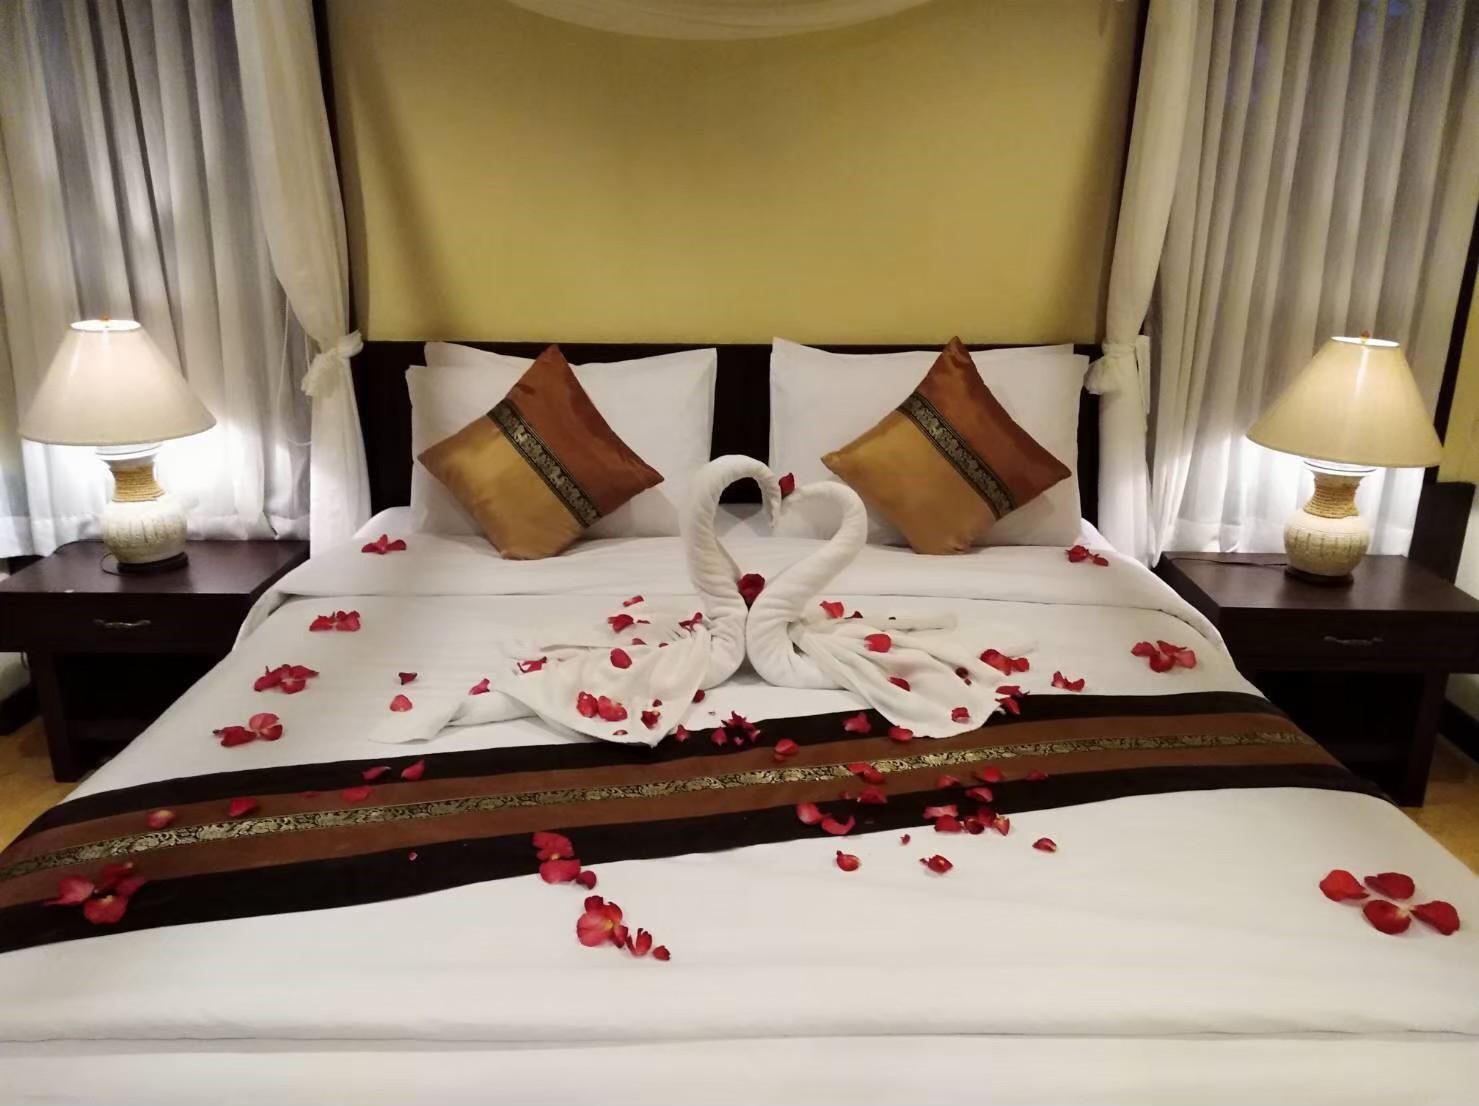 Lanna Country Resort 32BR w/ Pool & Breakfast วิลลา 21 ห้องนอน 21 ห้องน้ำส่วนตัว ขนาด 3324 ตร.ม. – สุเทพ